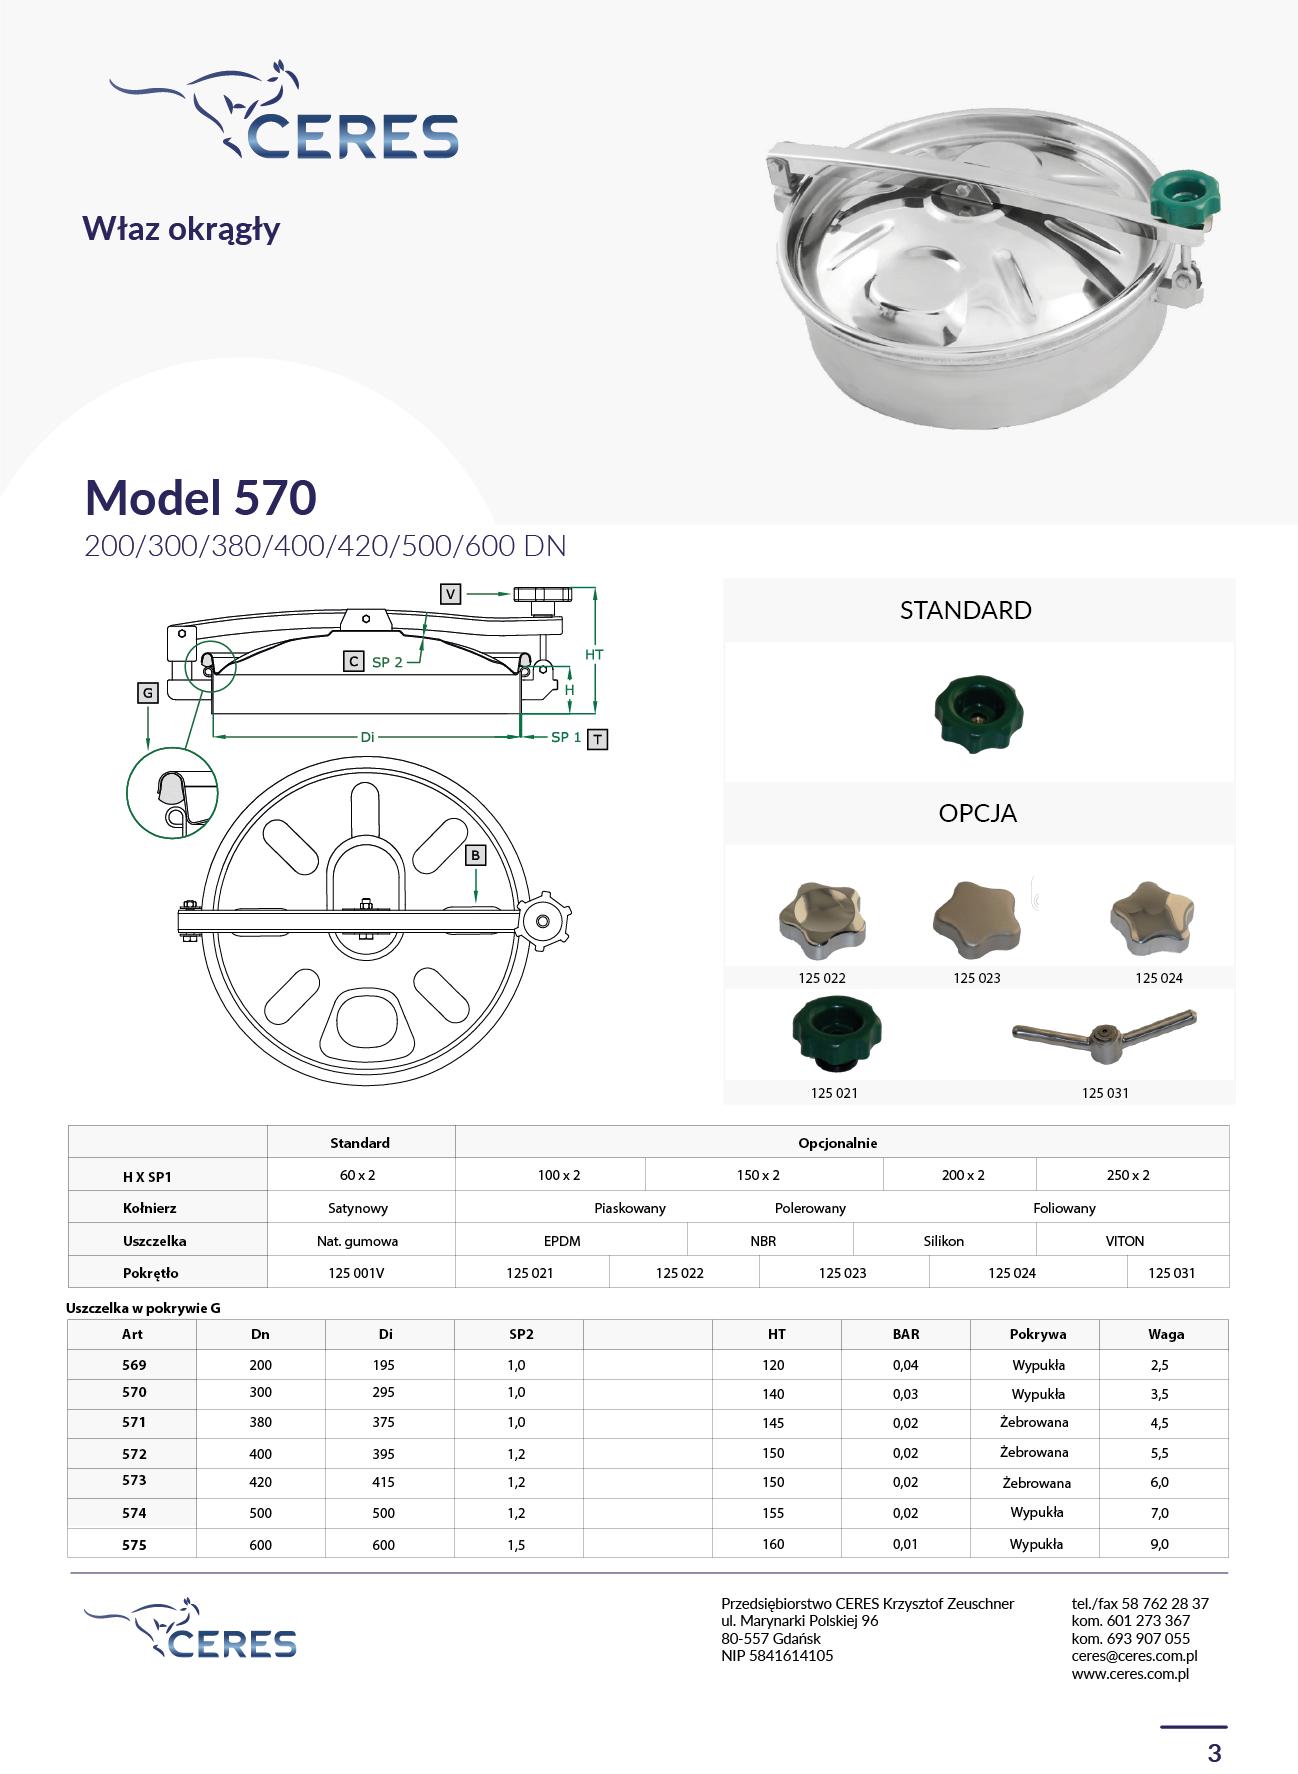 MODEL 570